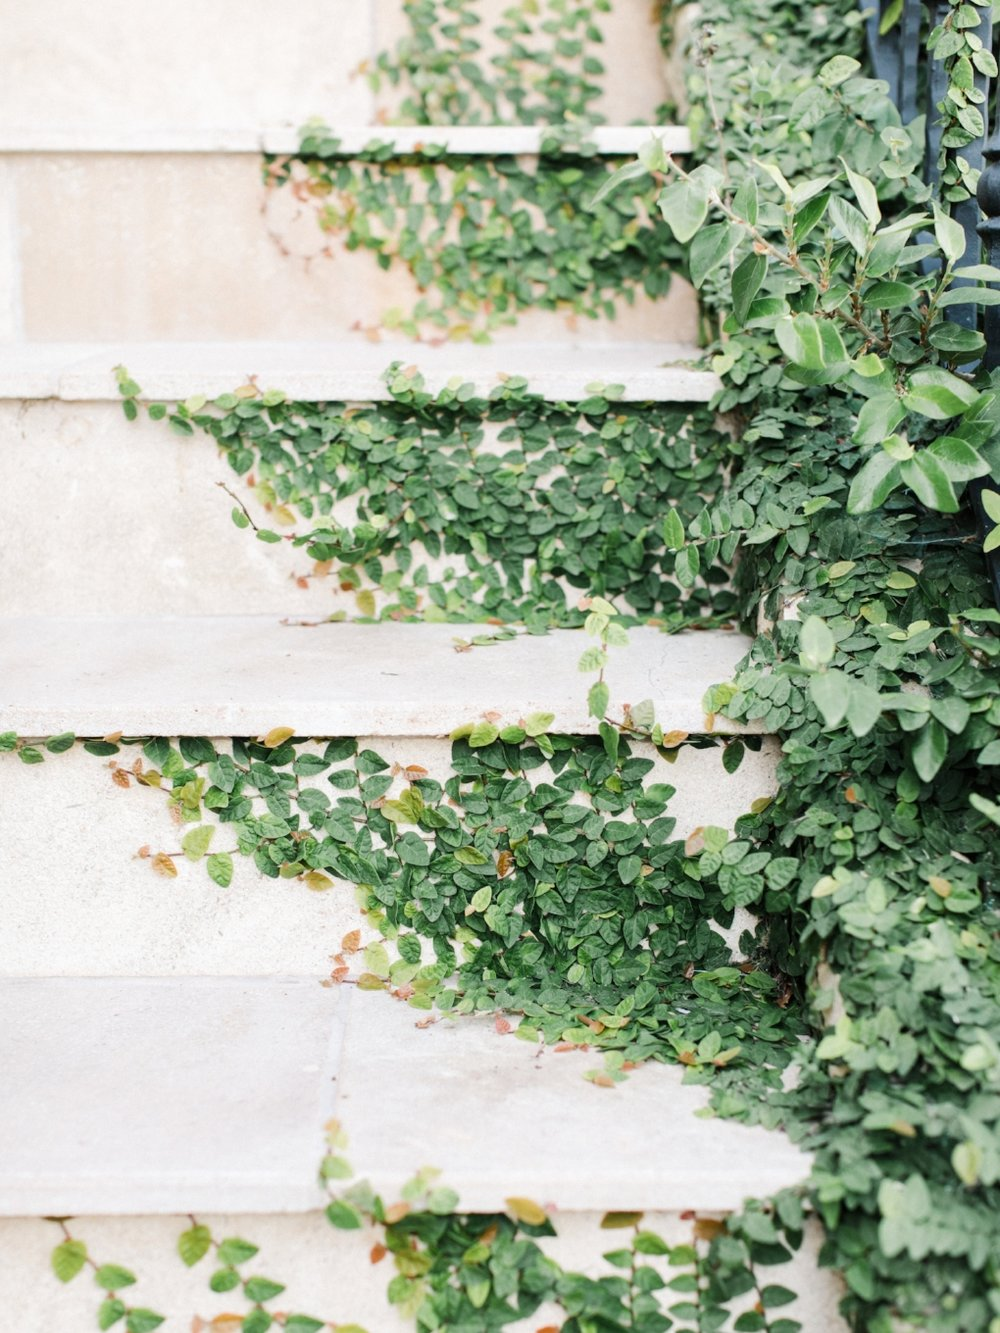 Rhianna_Mercier_Photography_Professional_Seccond_shooter_Ivy_on_stairs_Kletner_Ranch_Santa Barbara_CA